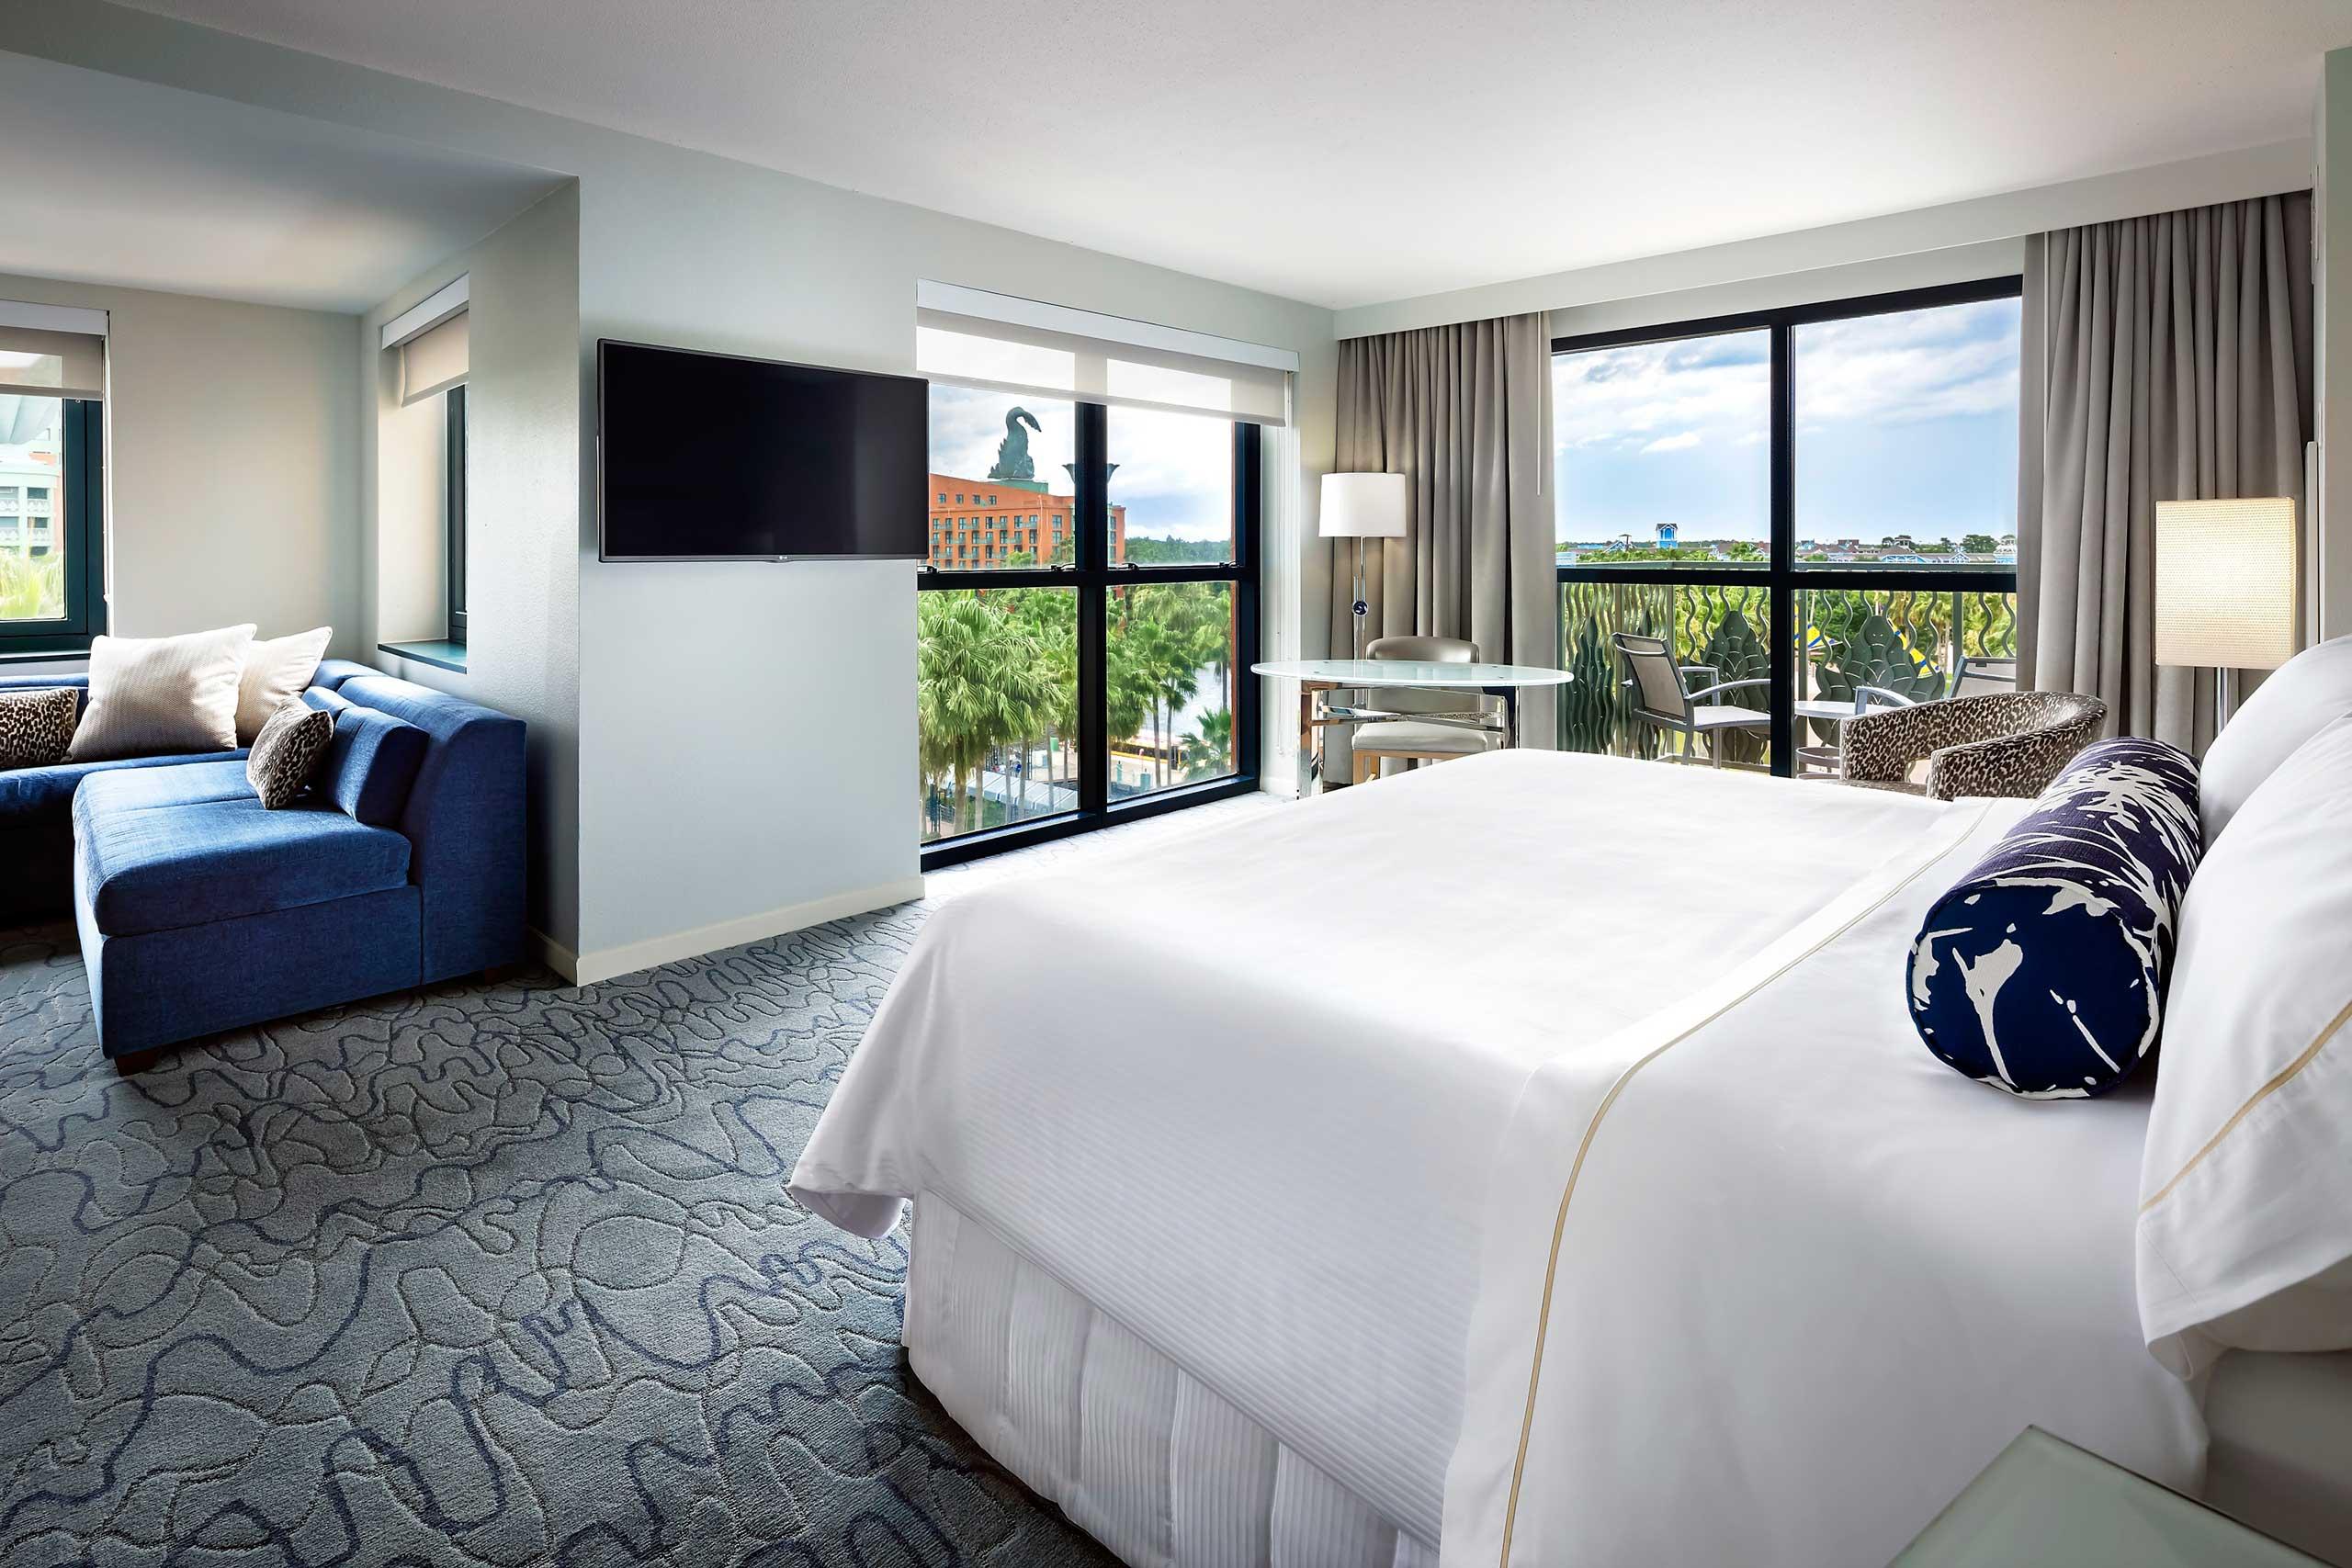 Walt Disney World Swan rooms - Photo 1 of 3